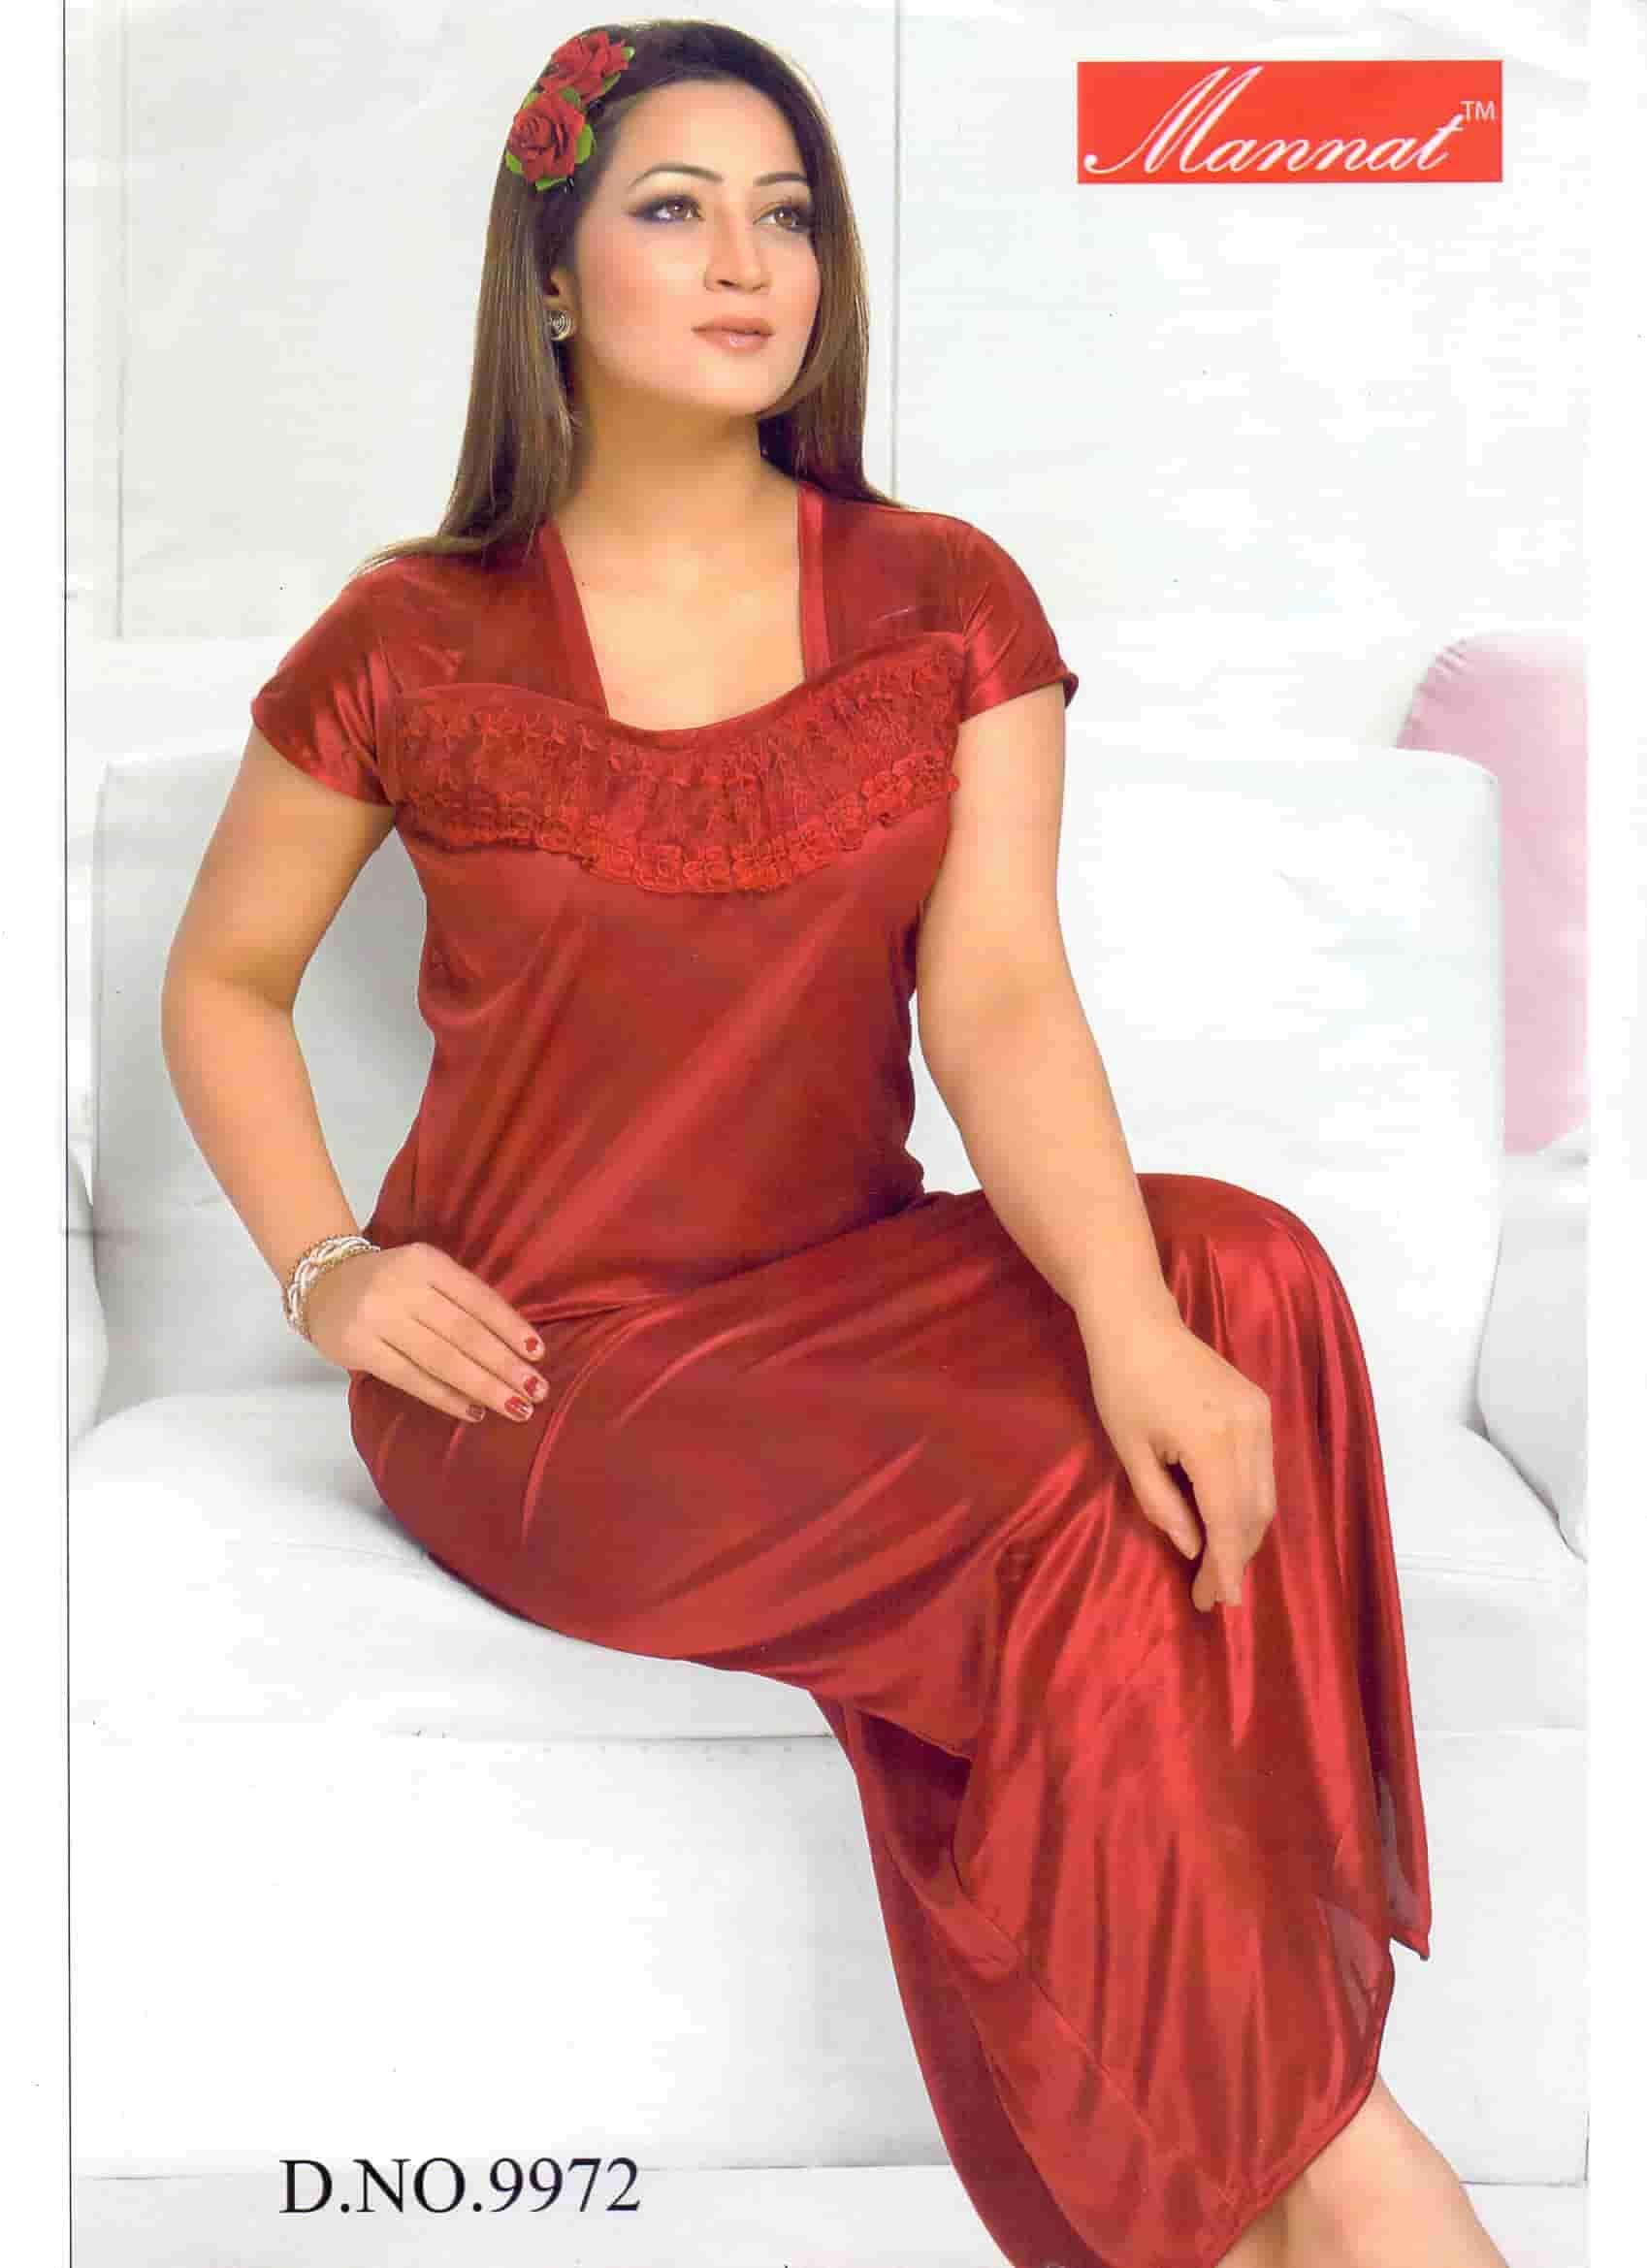 a765095d24 (Amazon.com)-Honeymoon Bridal Lingerie Intimates Transparent.  (Amazon.com)-Honeymoon Bridal Lingerie Intimates Transparent Night Dress  Online ...